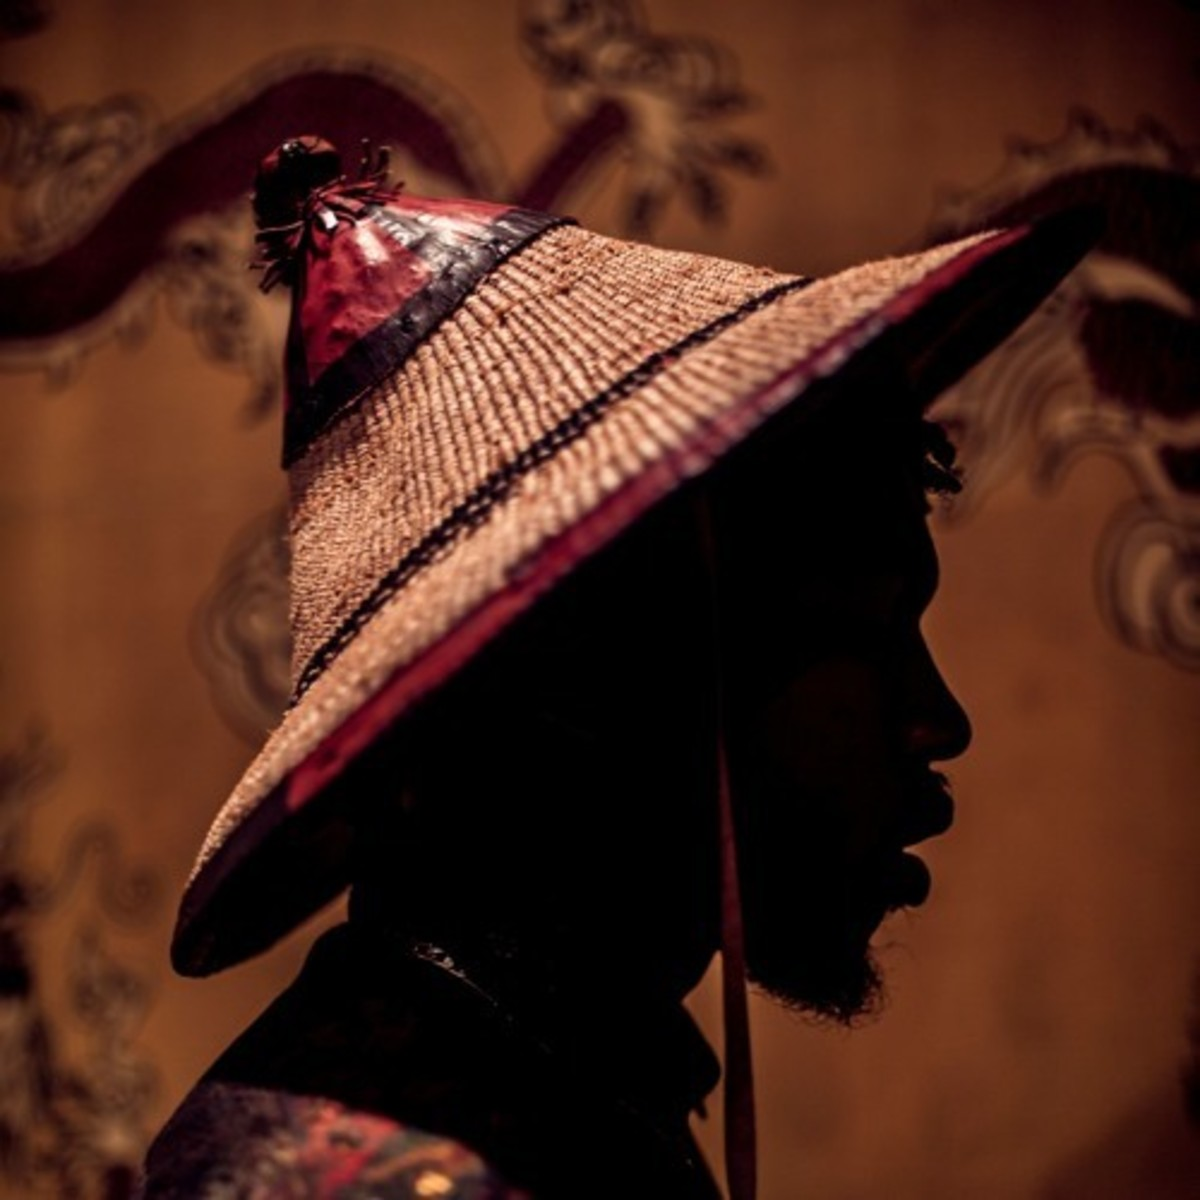 prince-okezie-vulture-culture2.jpg